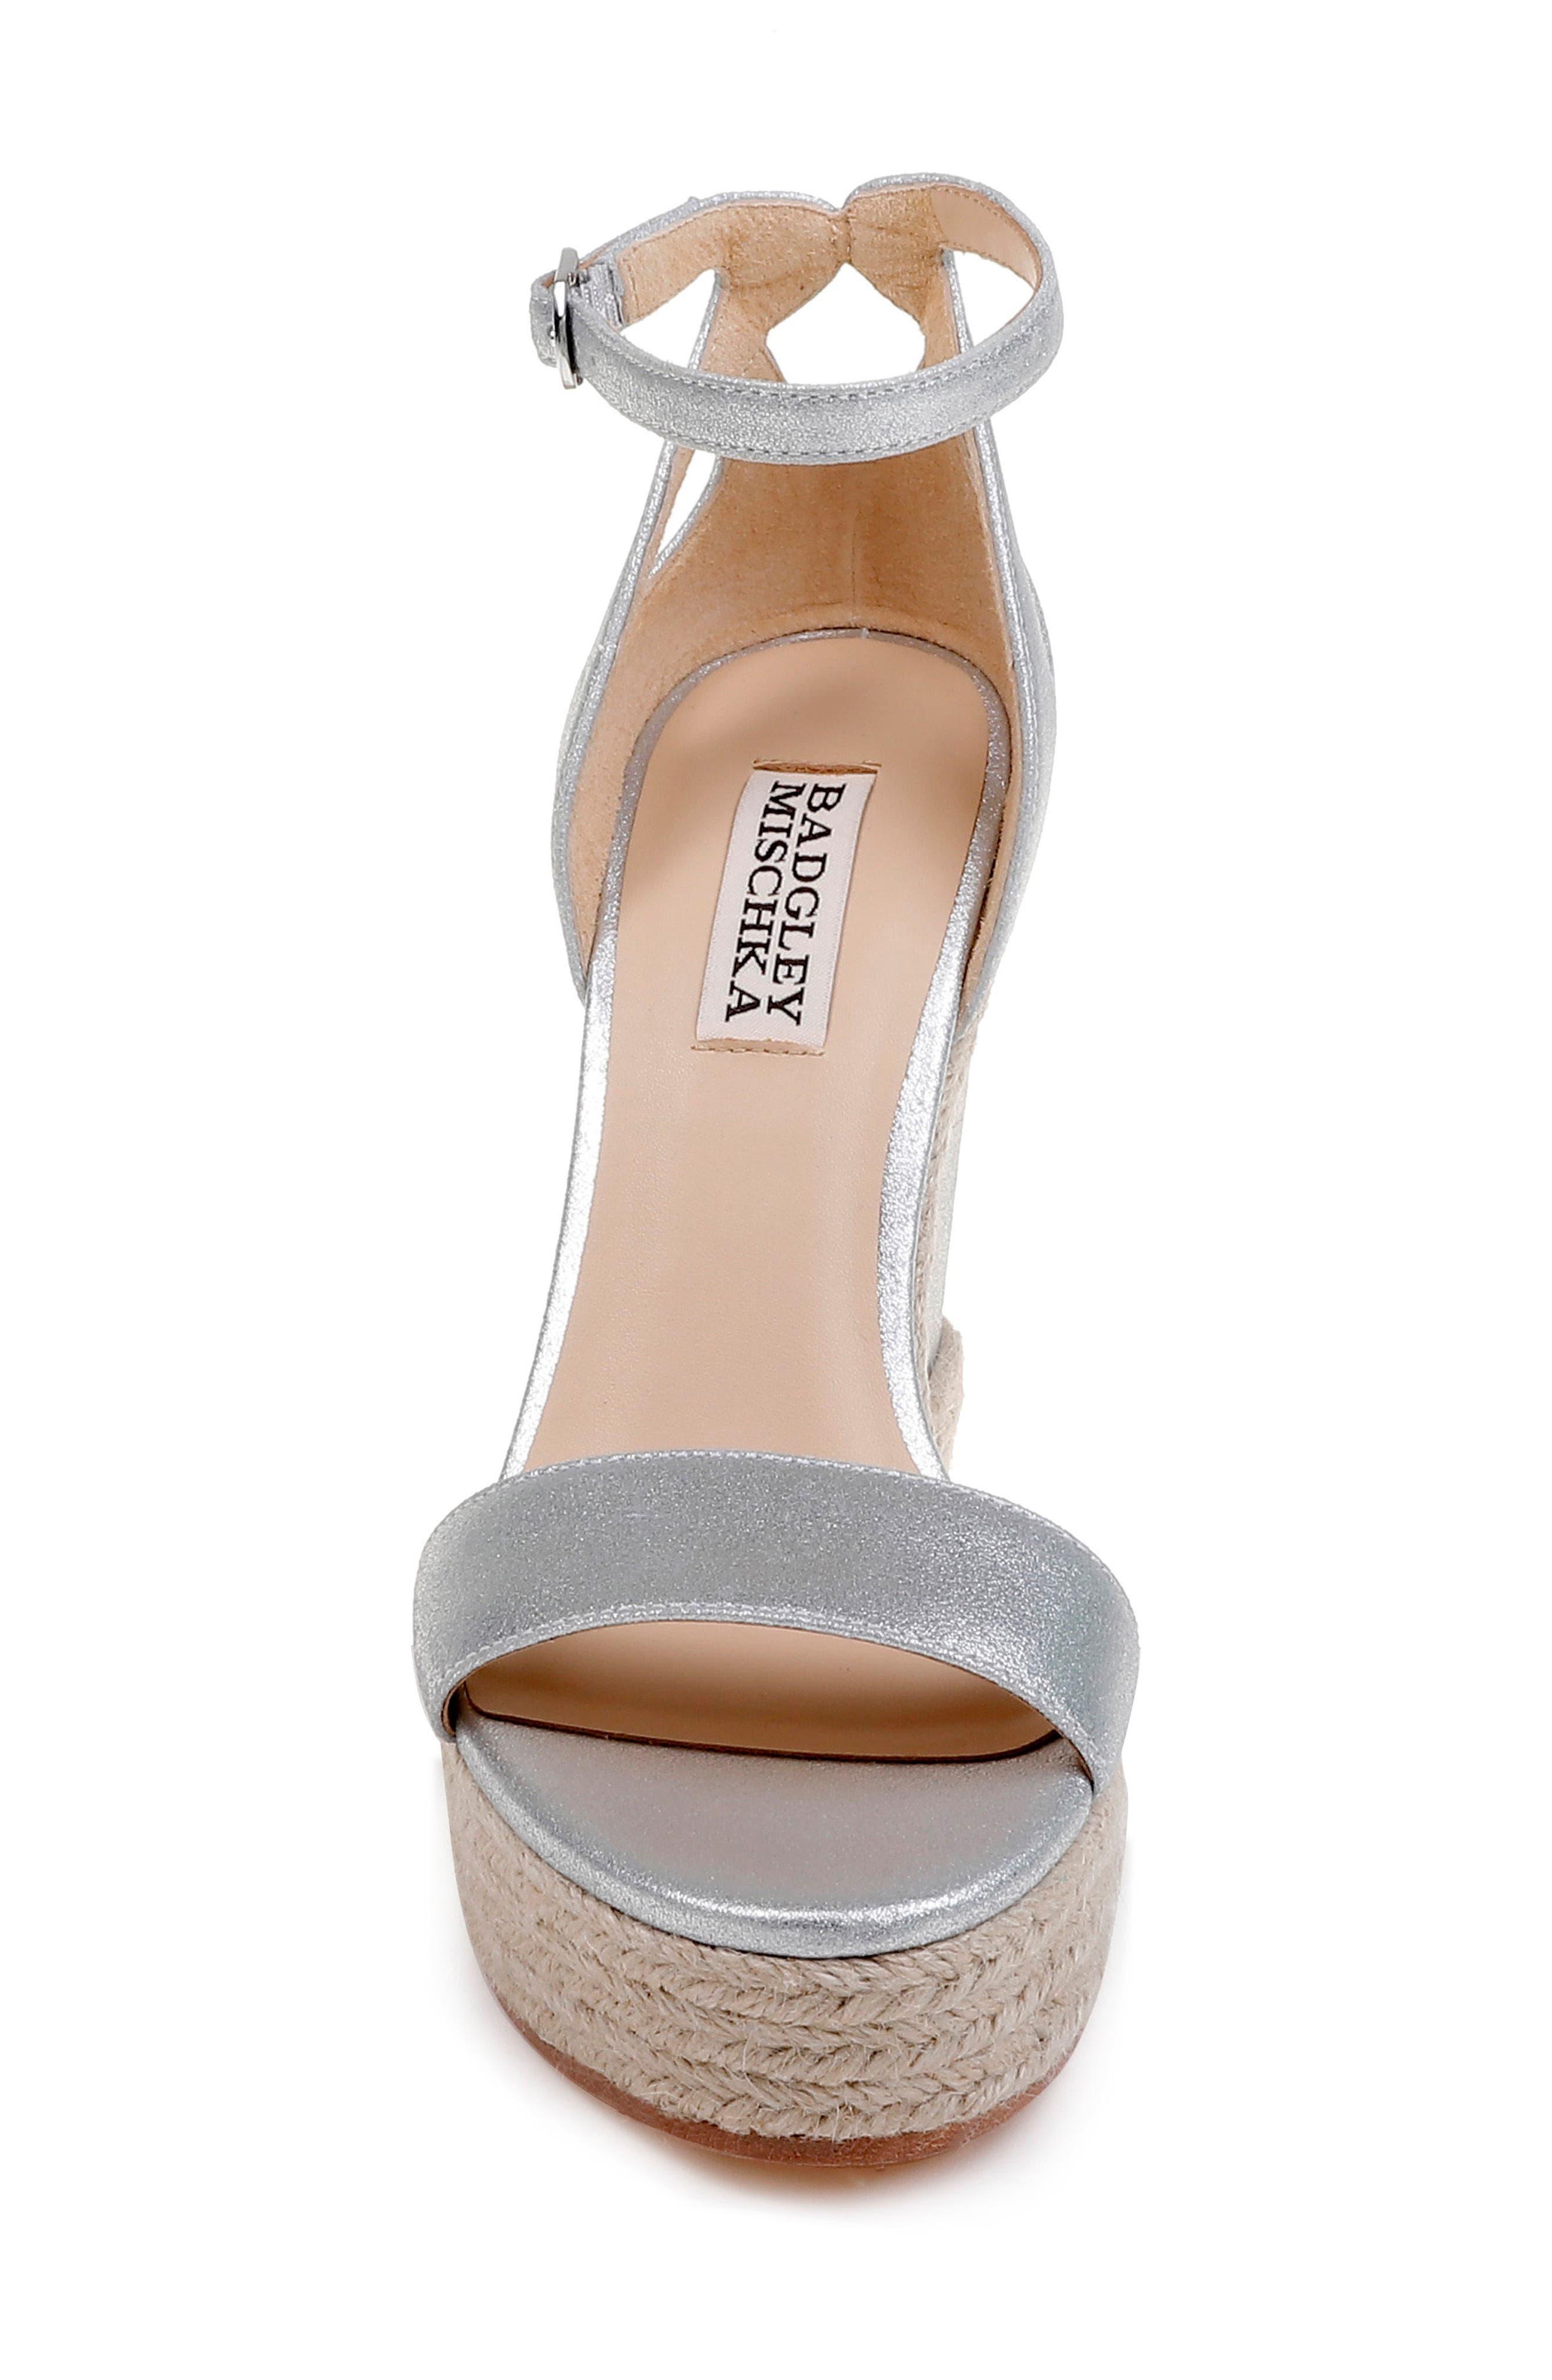 Honest Espadrille Wedge Sandal,                             Alternate thumbnail 4, color,                             Silver Metallic Suede